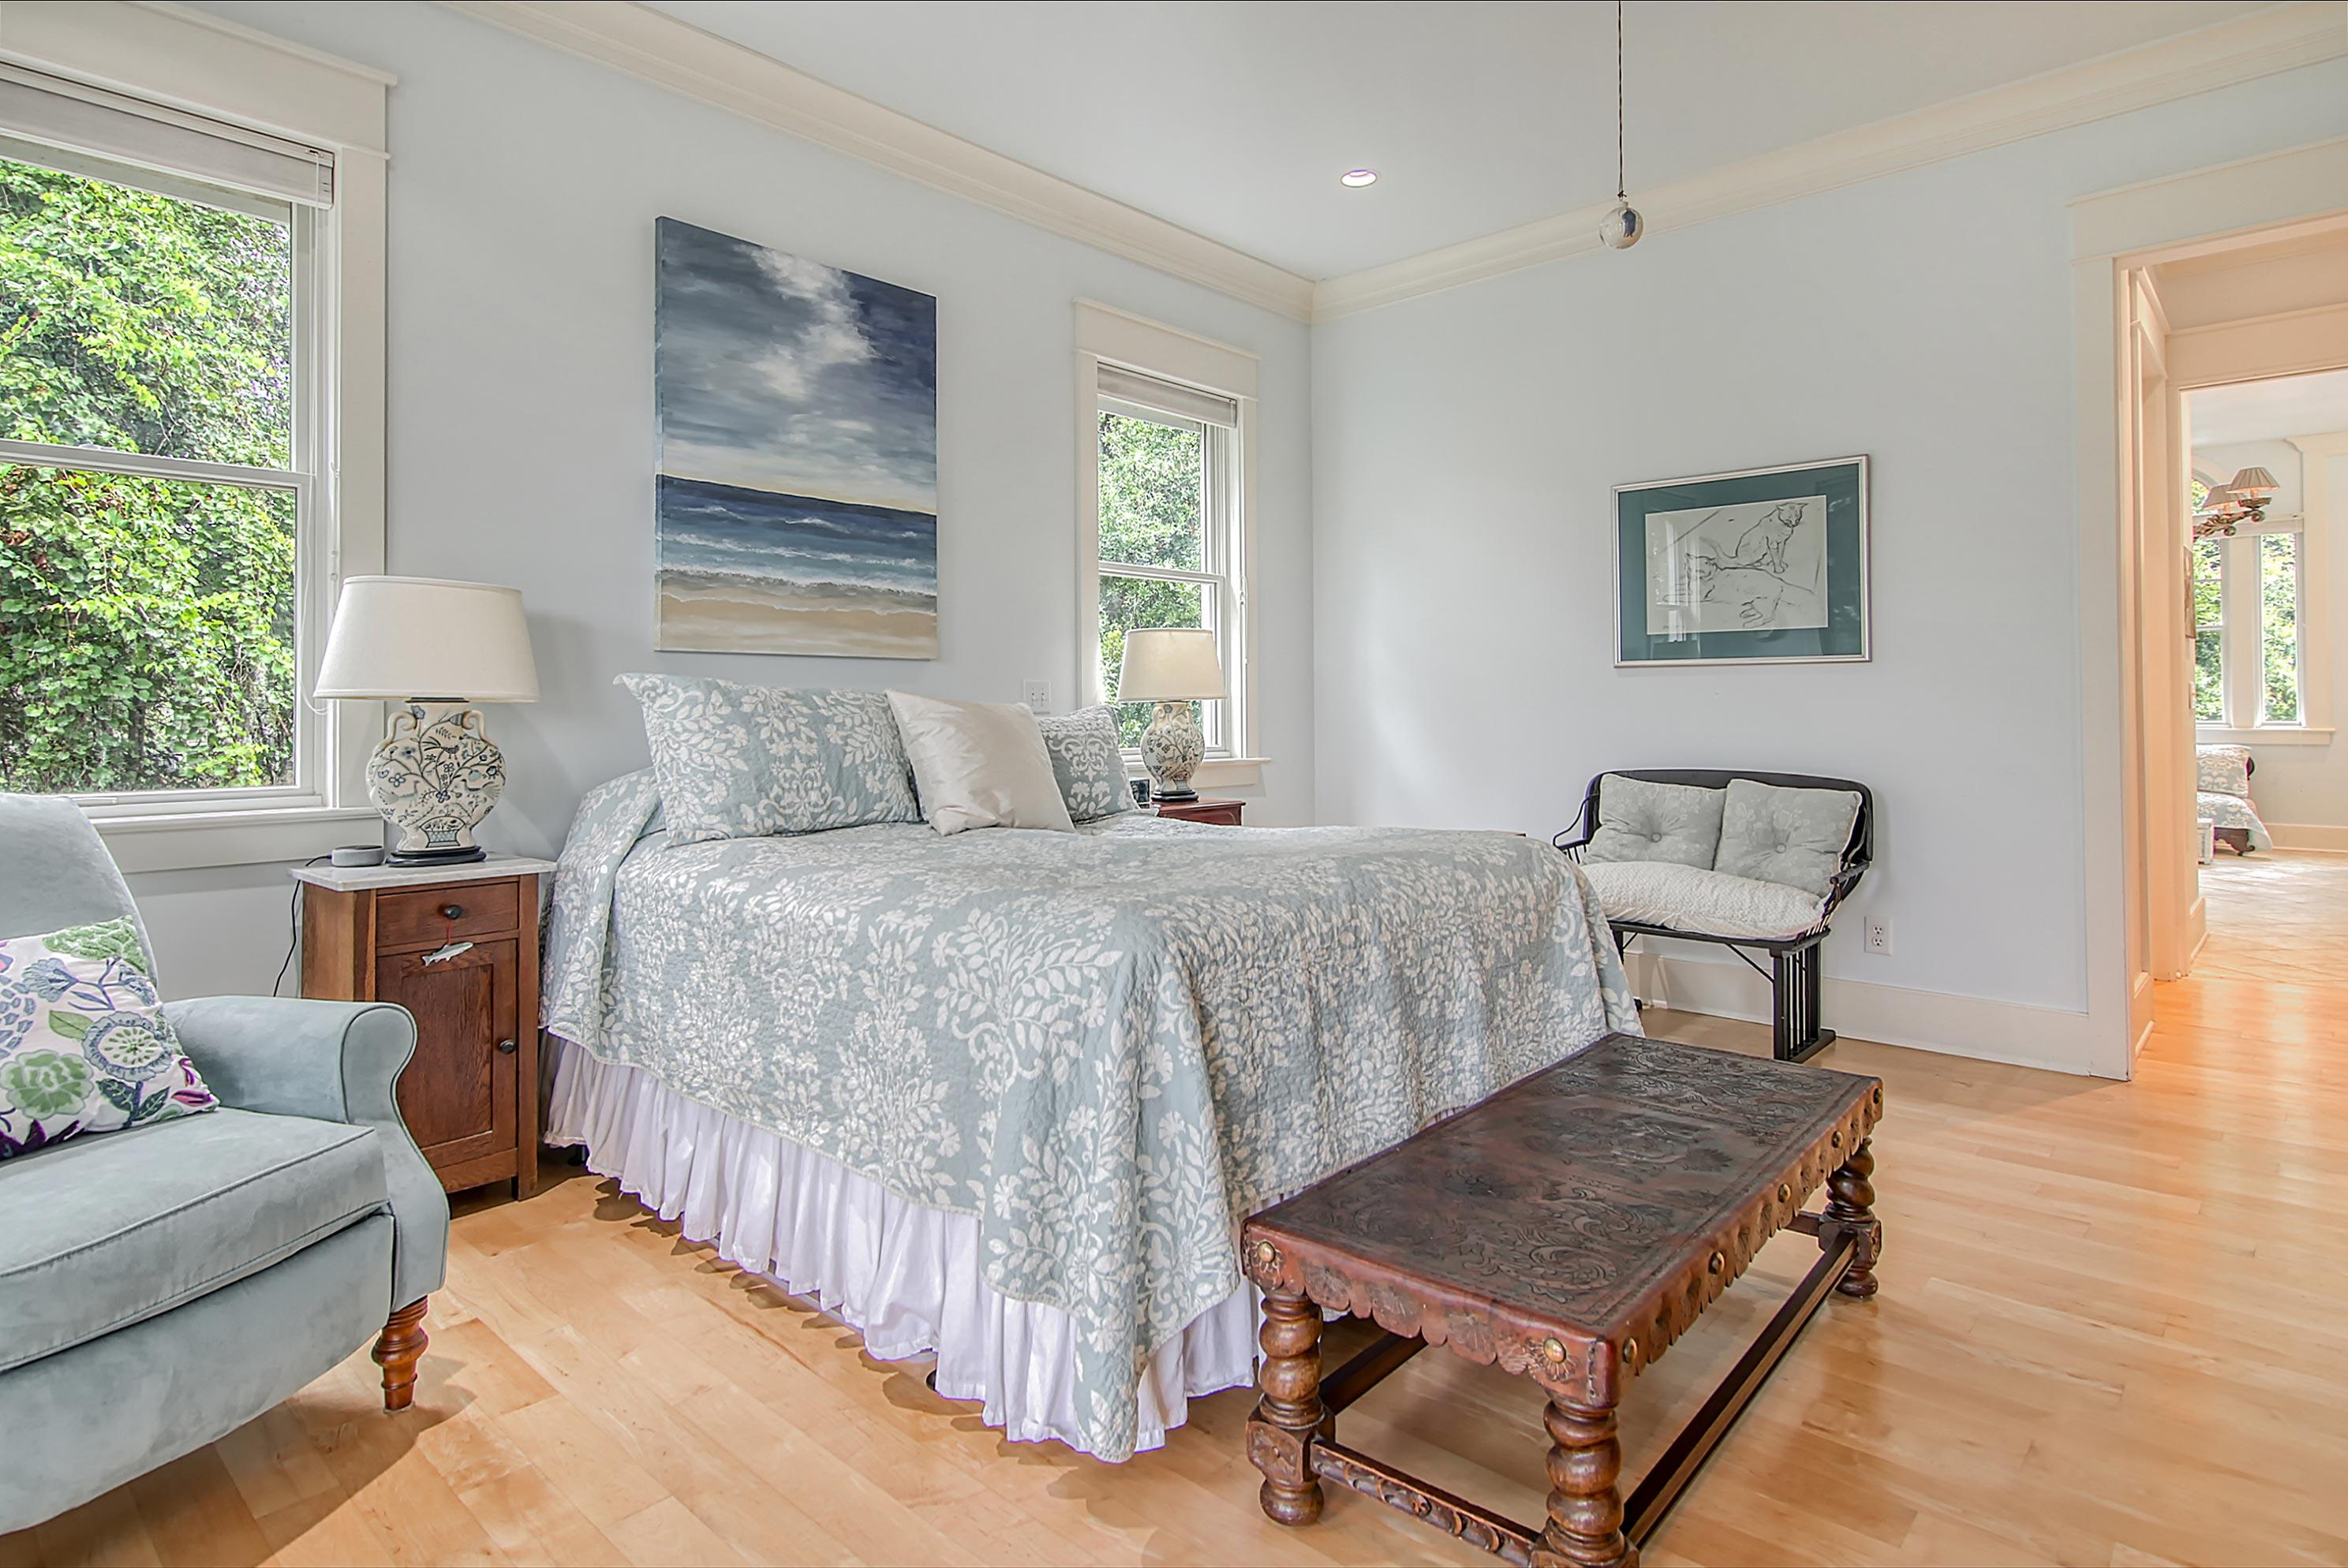 Scanlonville Homes For Sale - 152 6th, Mount Pleasant, SC - 25